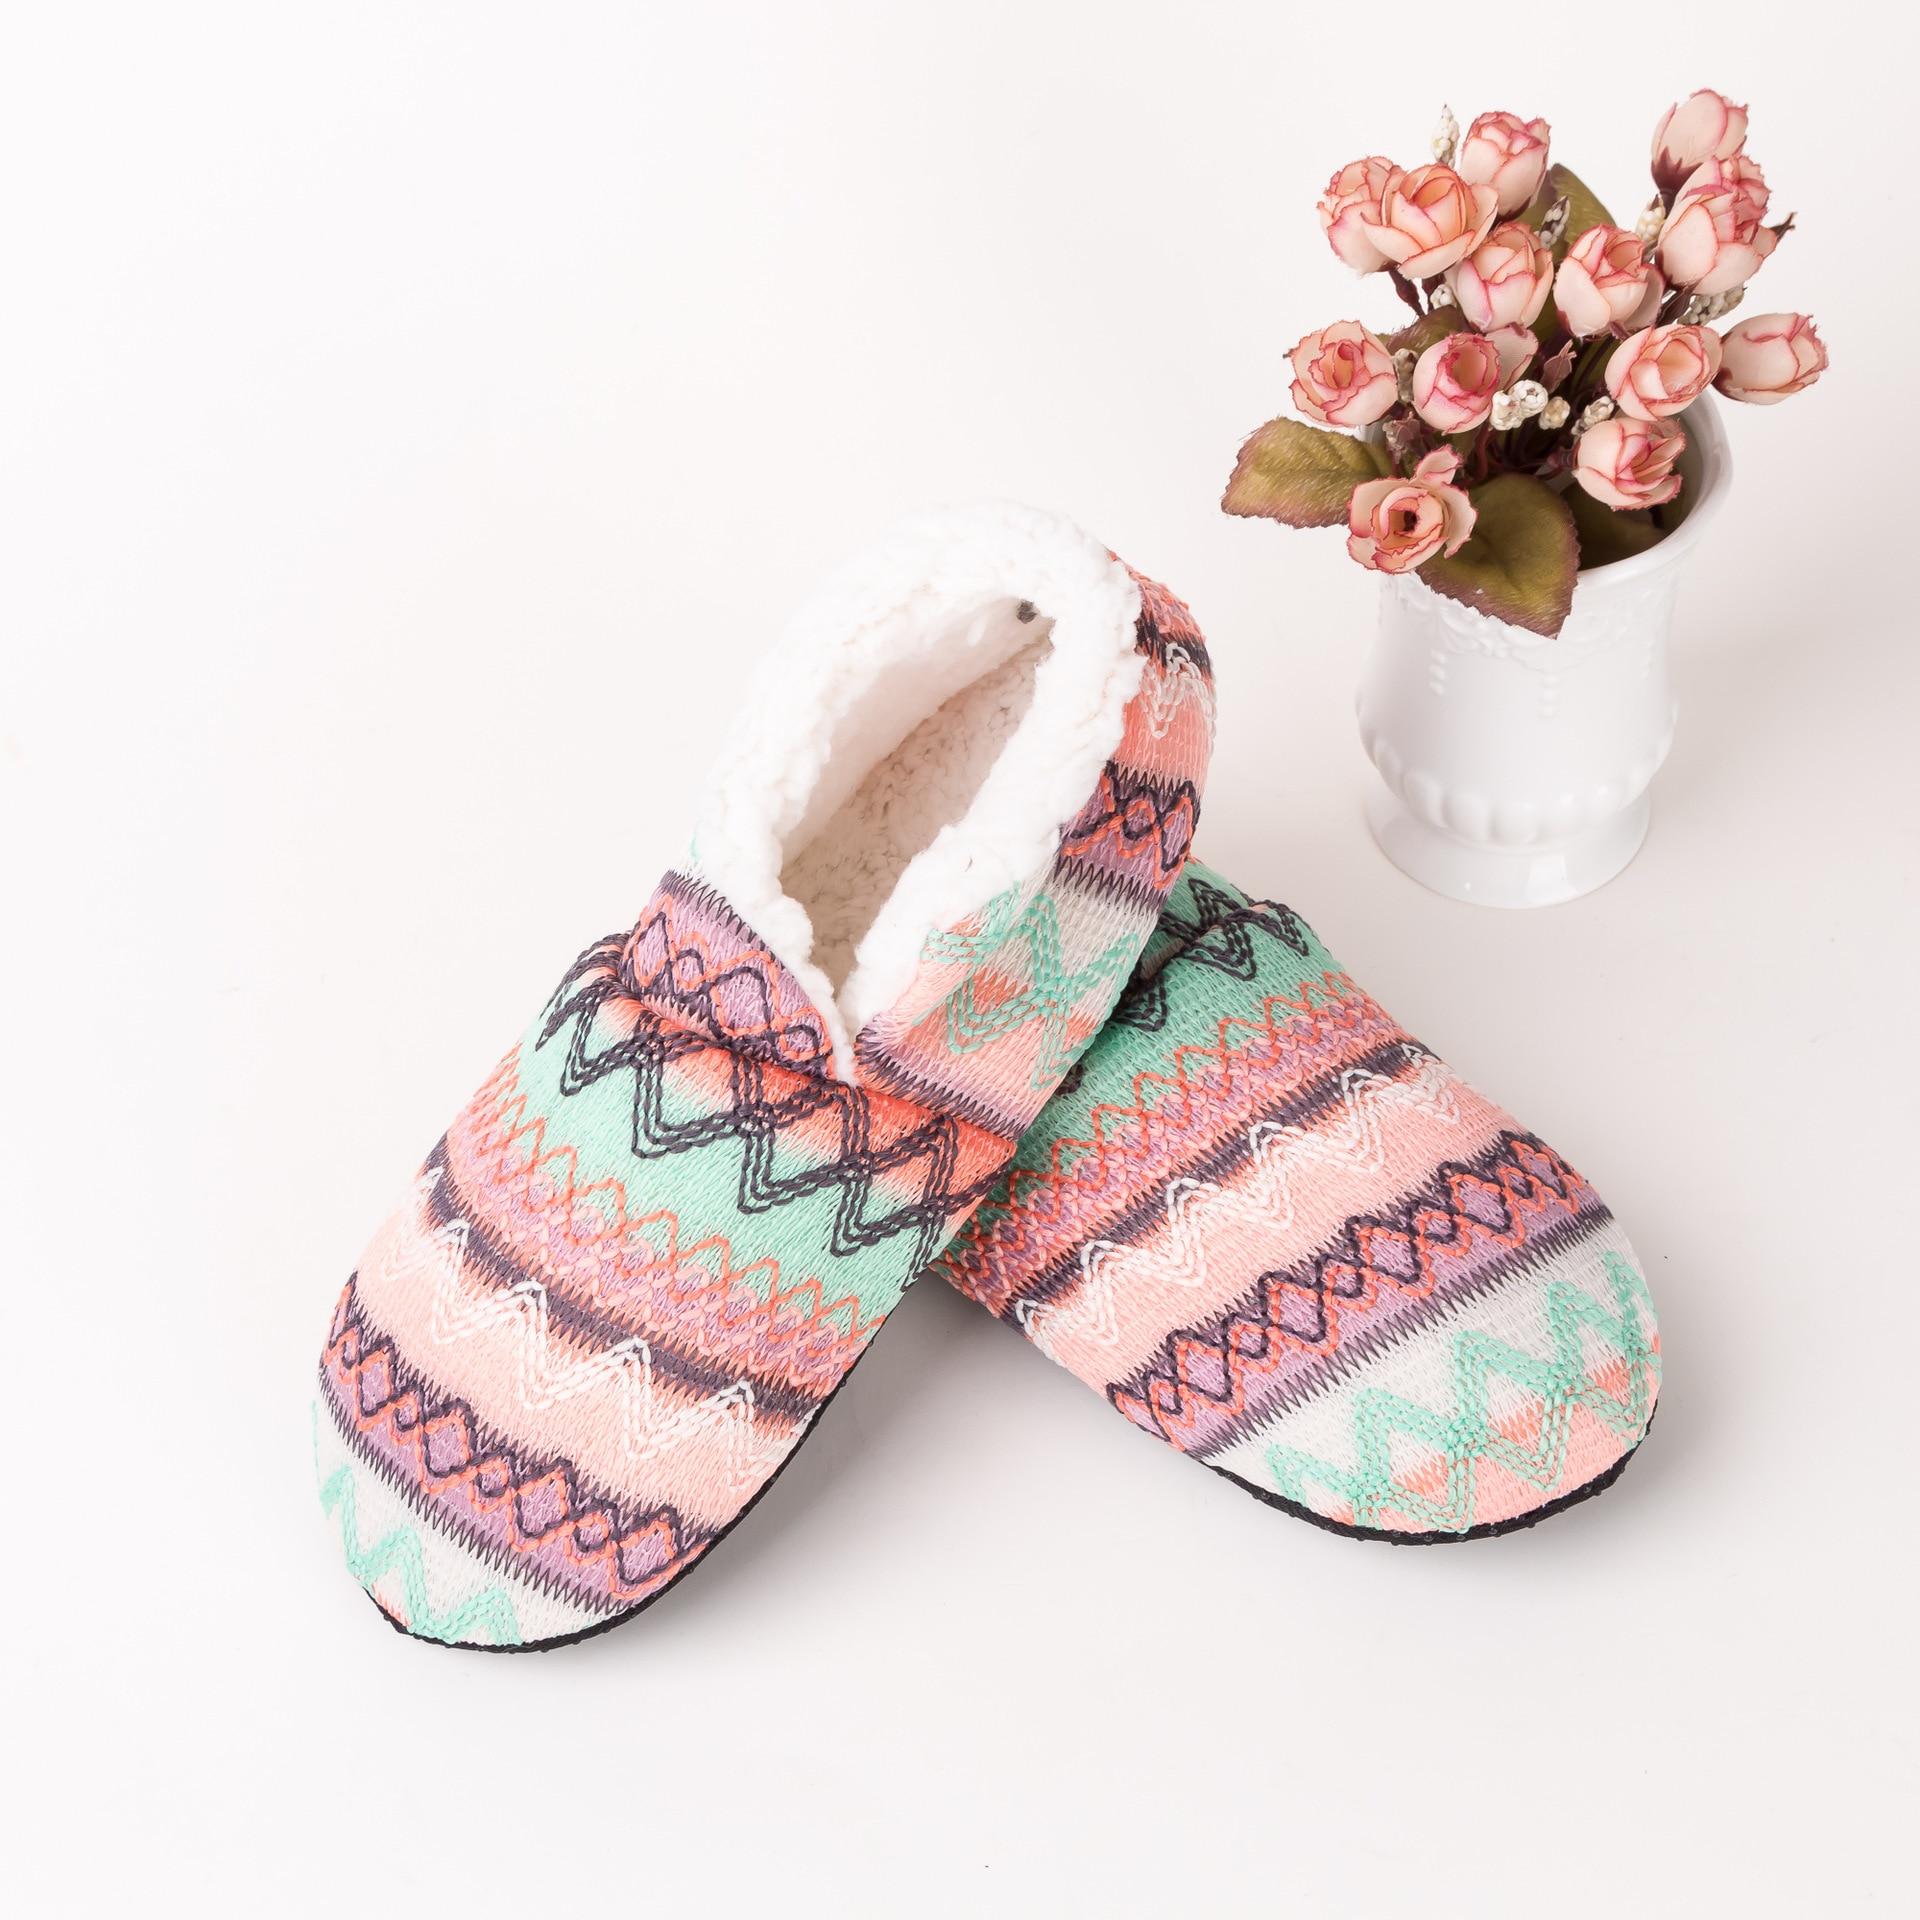 Botas cálidas de invierno, zapatos de calcetín para mujer, zapatos de suelo de felpa de lana, suela blanda antideslizante, talla libre